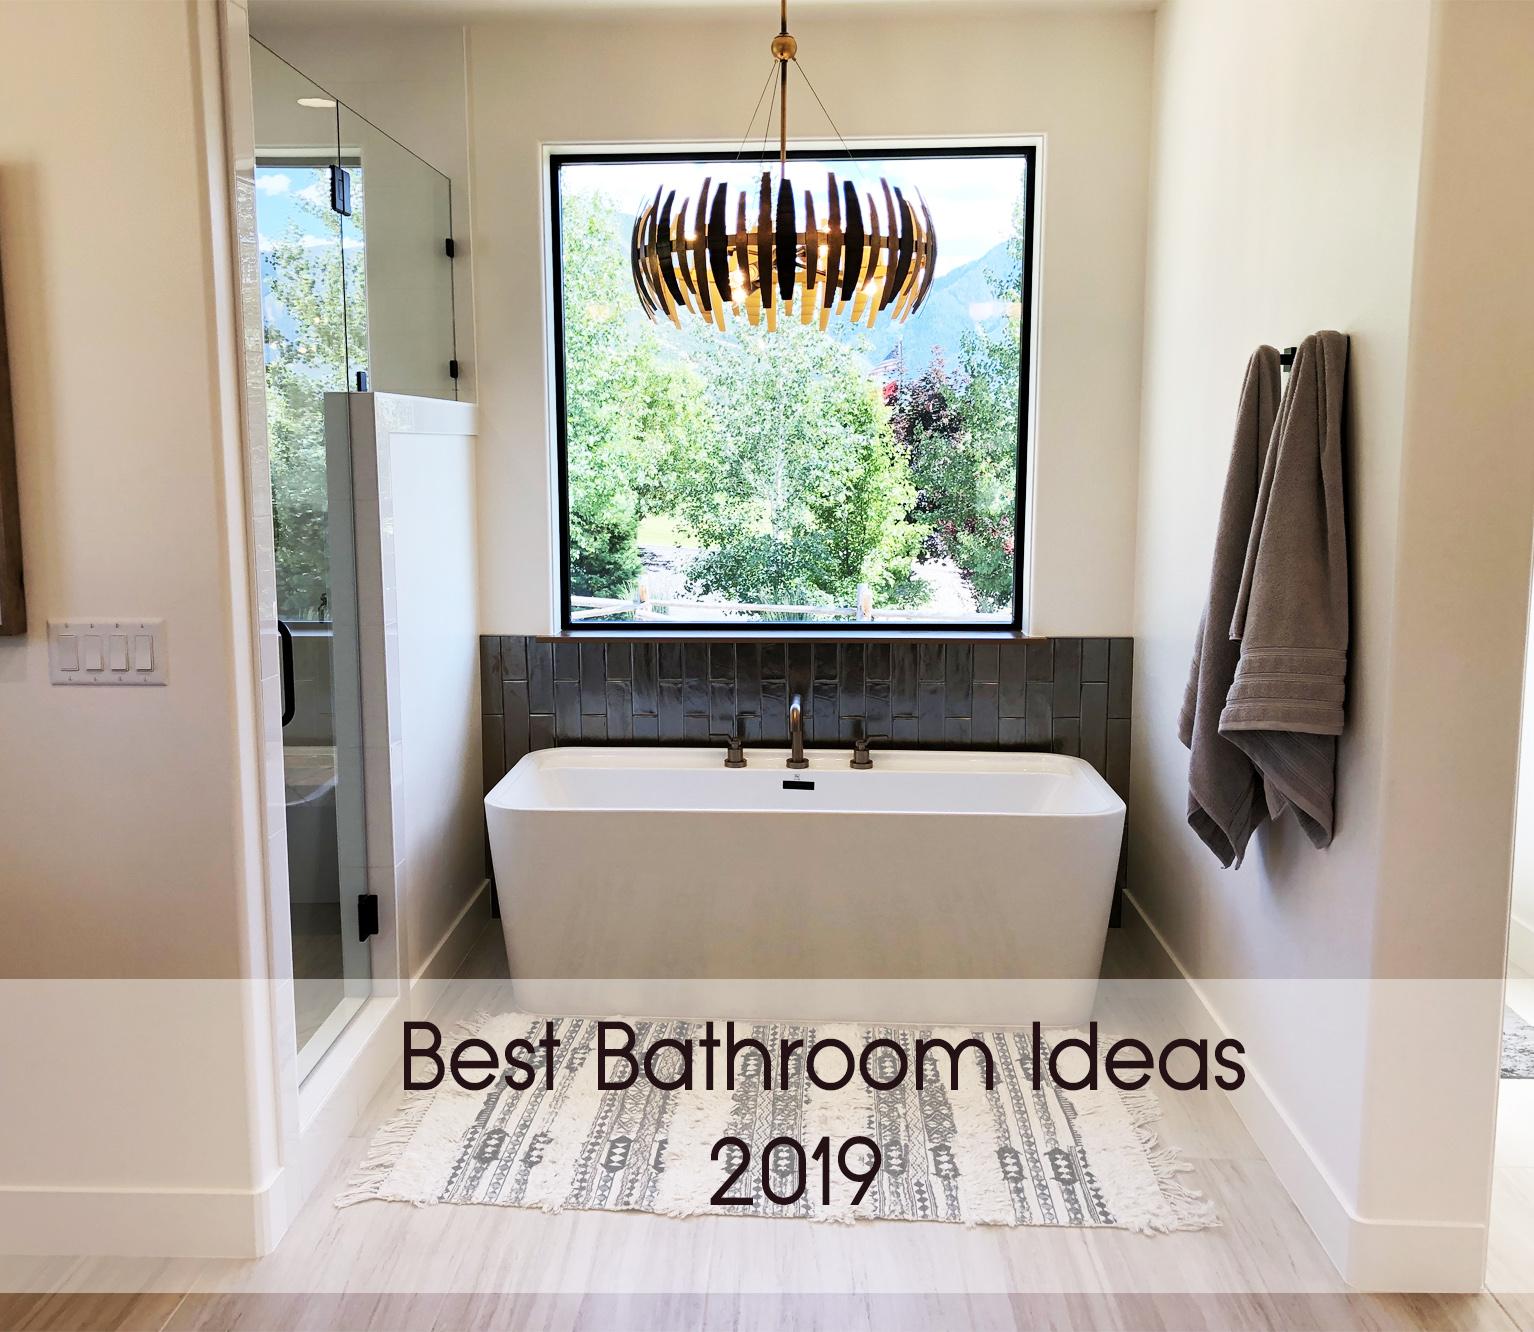 Best Bathroom Ideas 2019